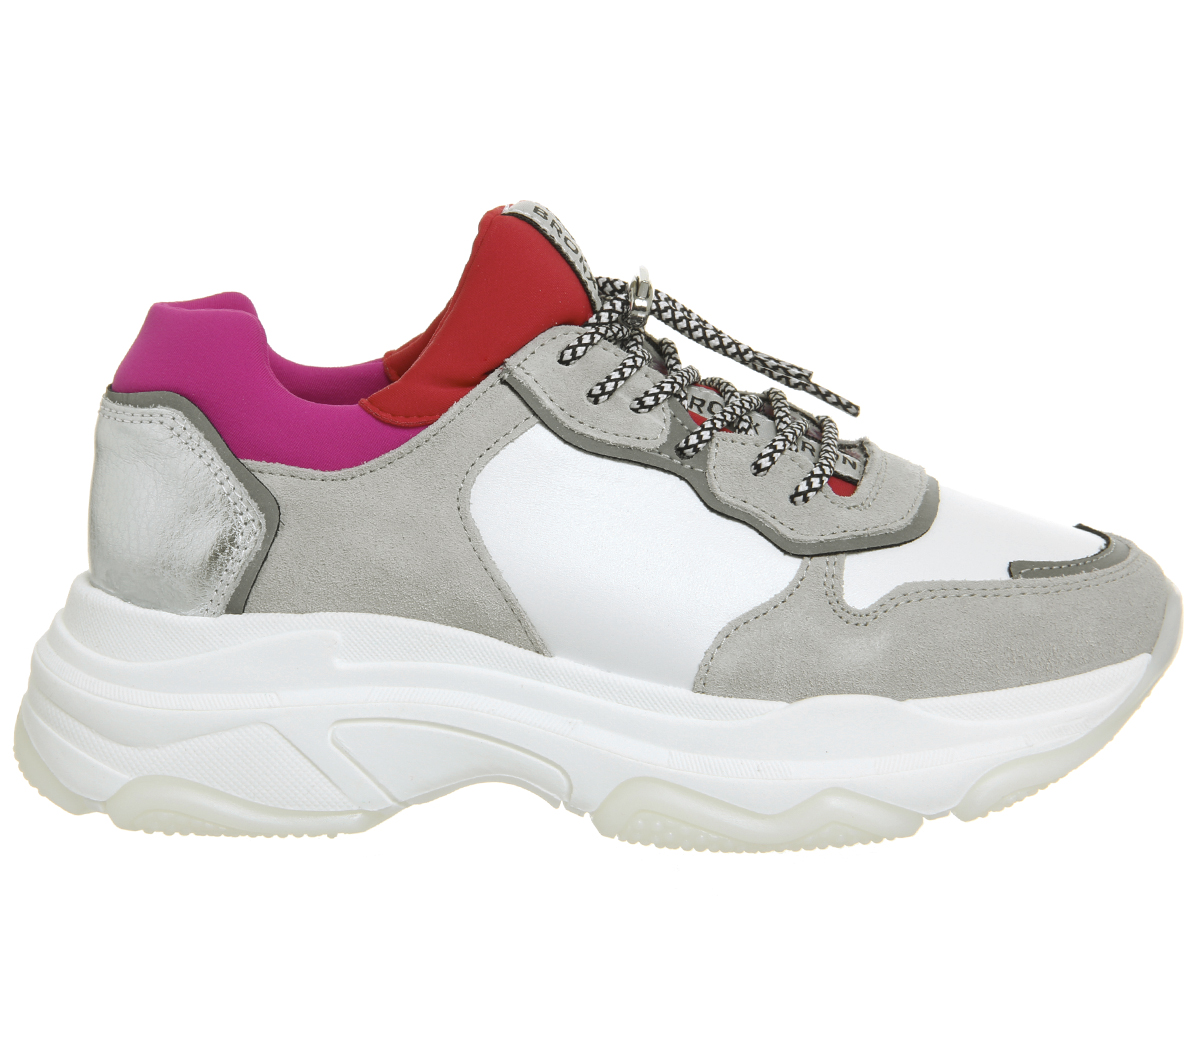 Damenschuhe Bronx Baisley ROT Trainers Weiß ROT Baisley Flats a1b157